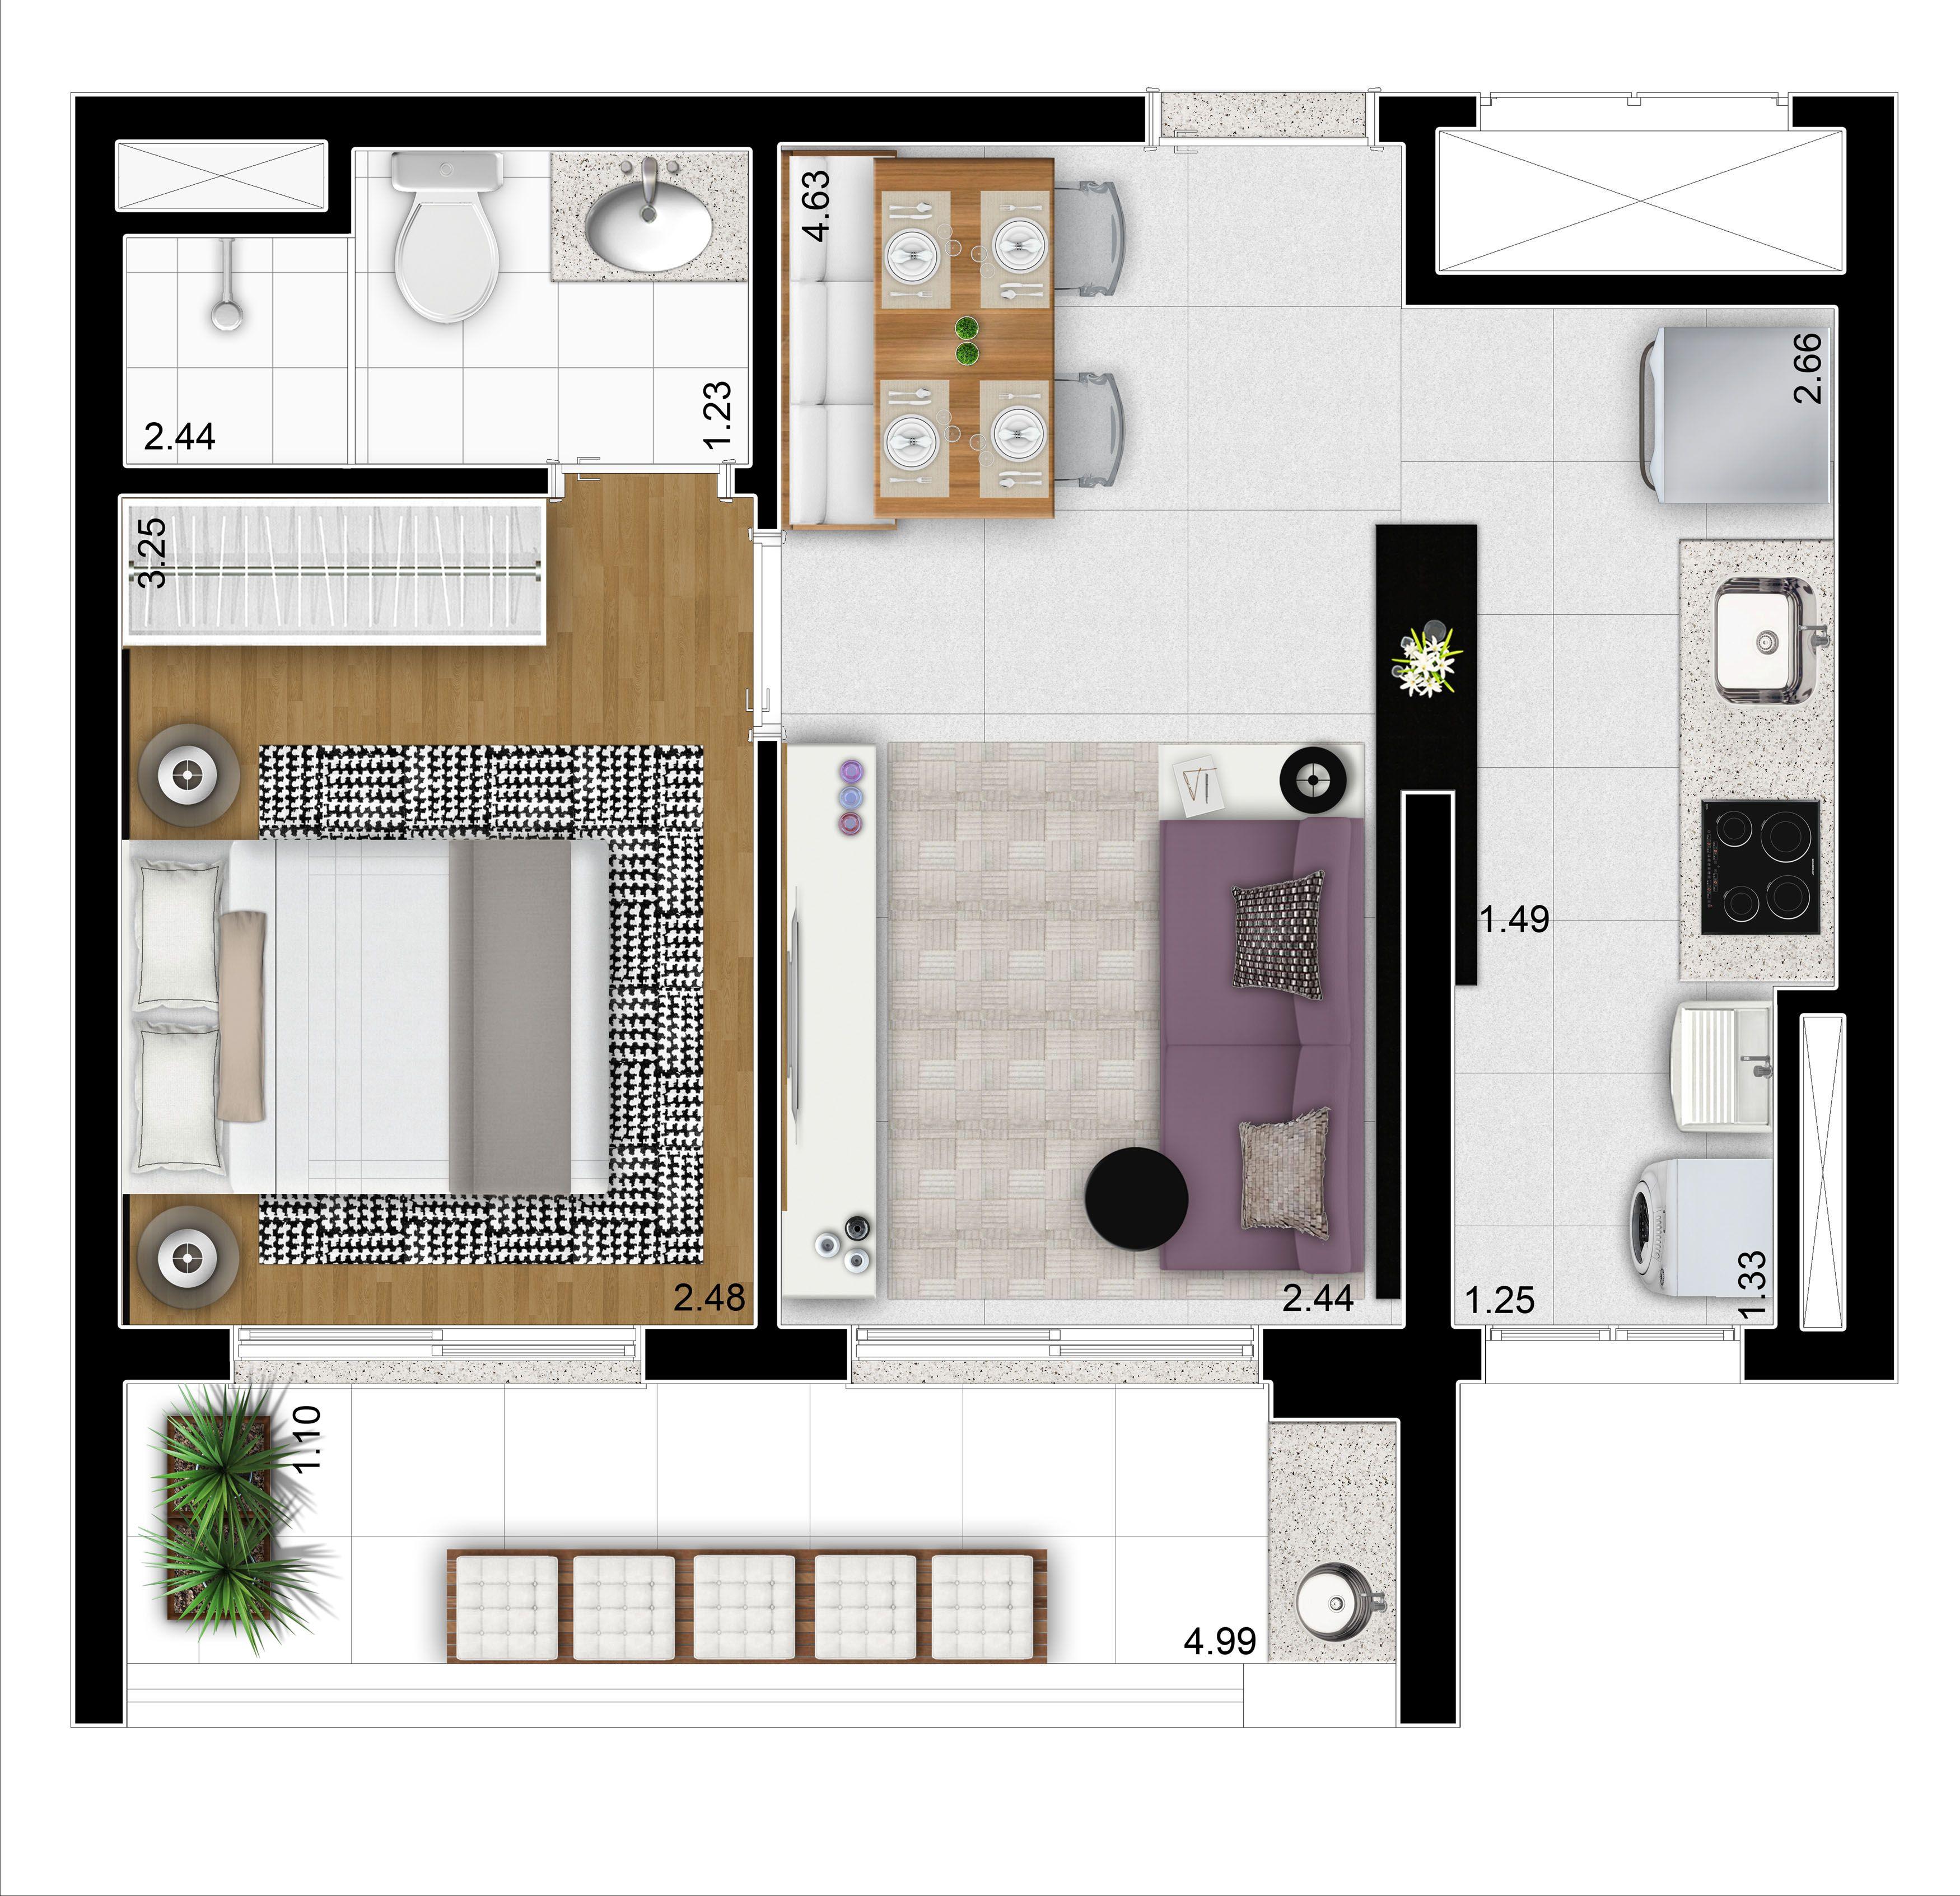 Pin by fran de campos on planta baixa pinterest for Apartment plans autocad